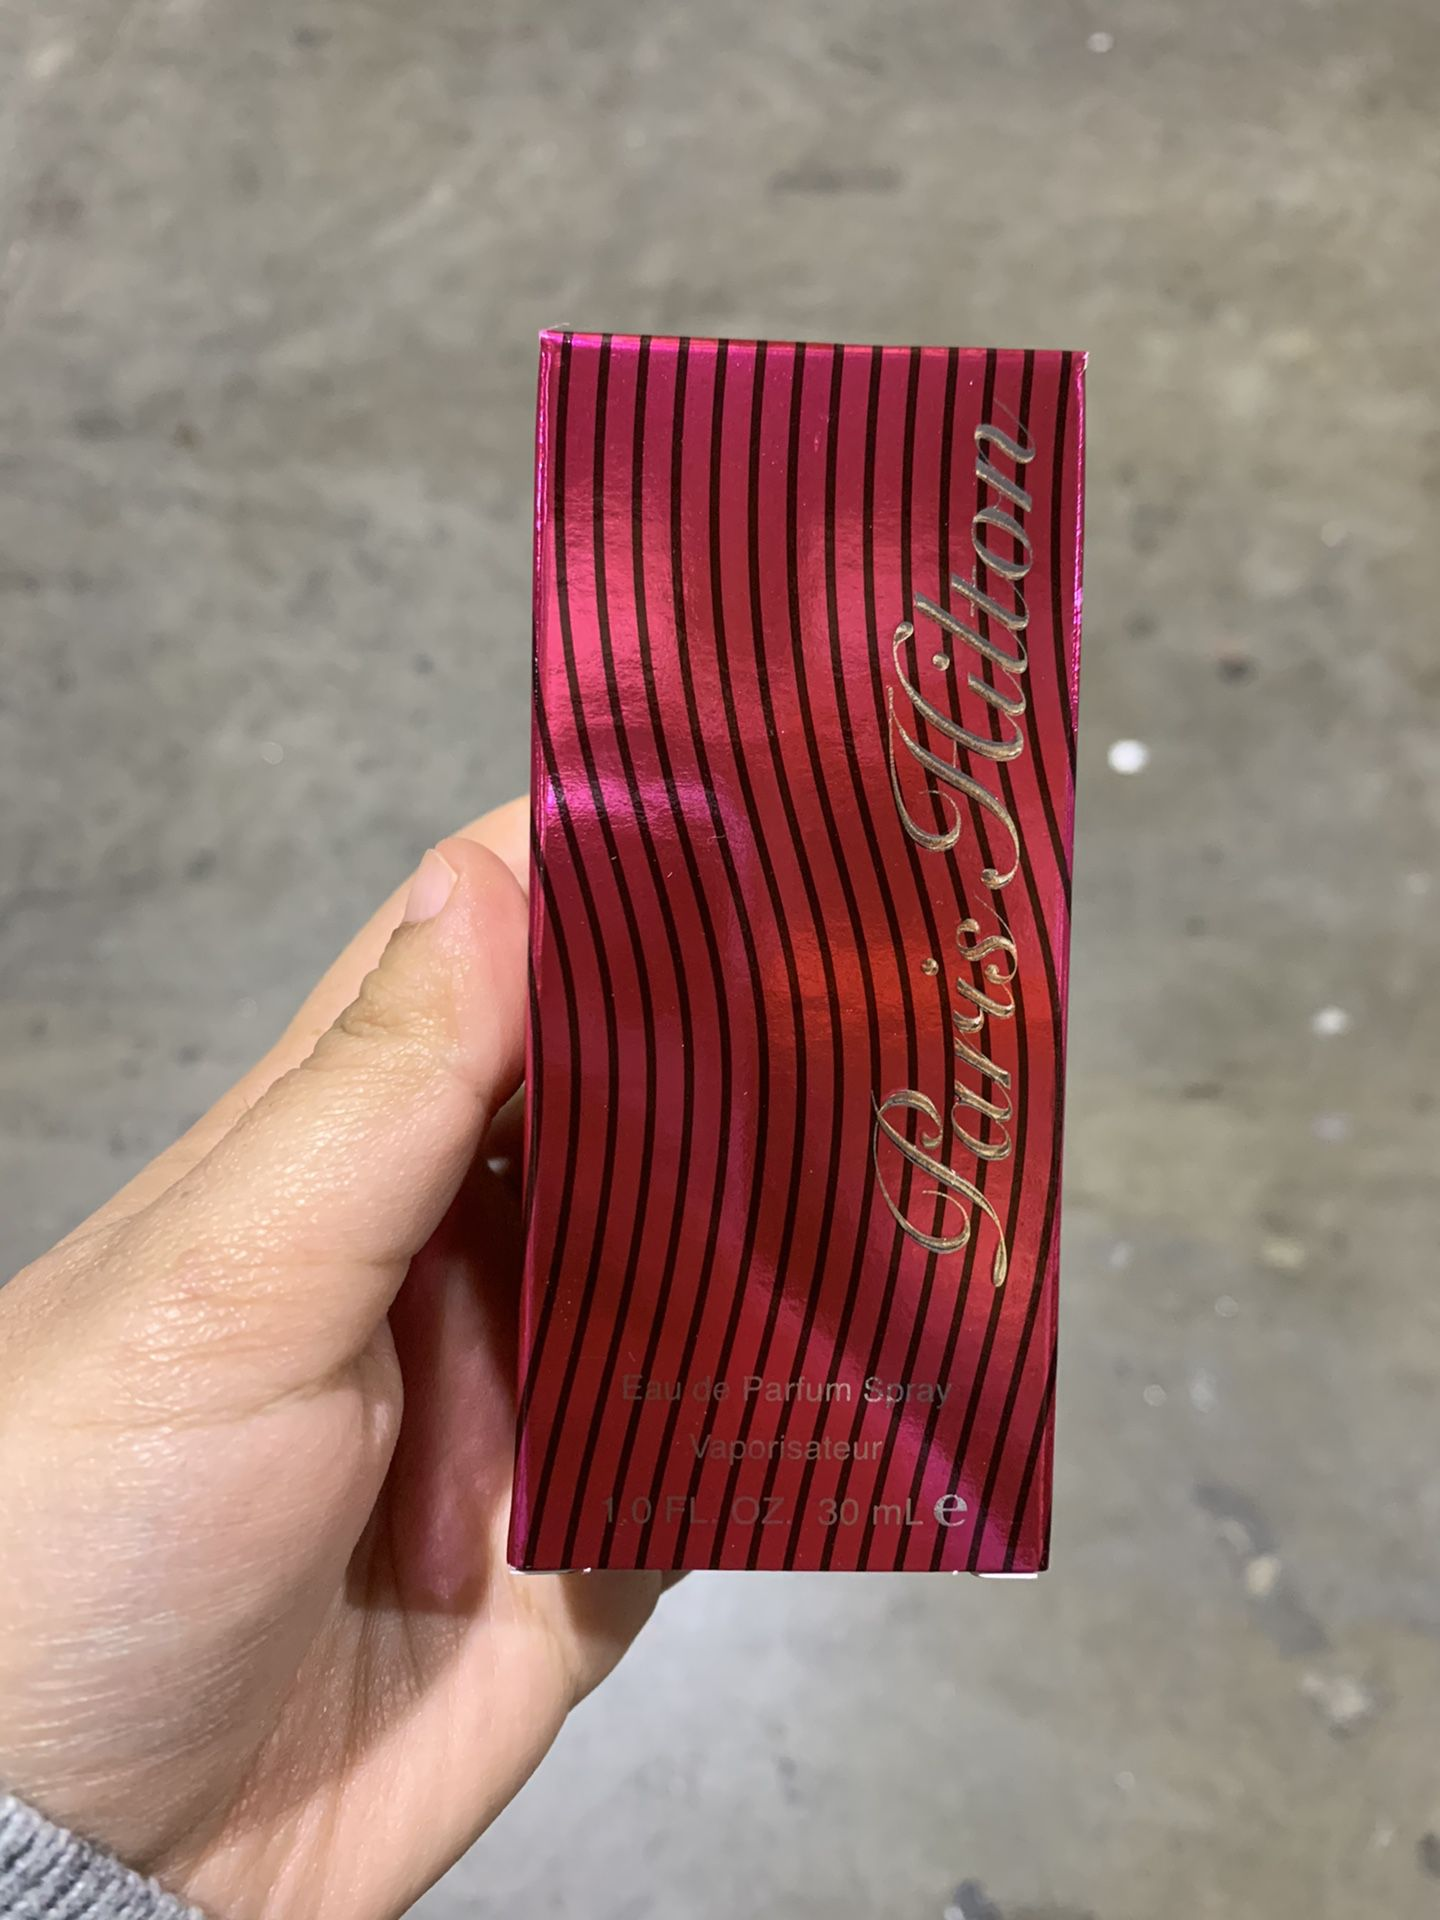 Paris Hilton Perfume